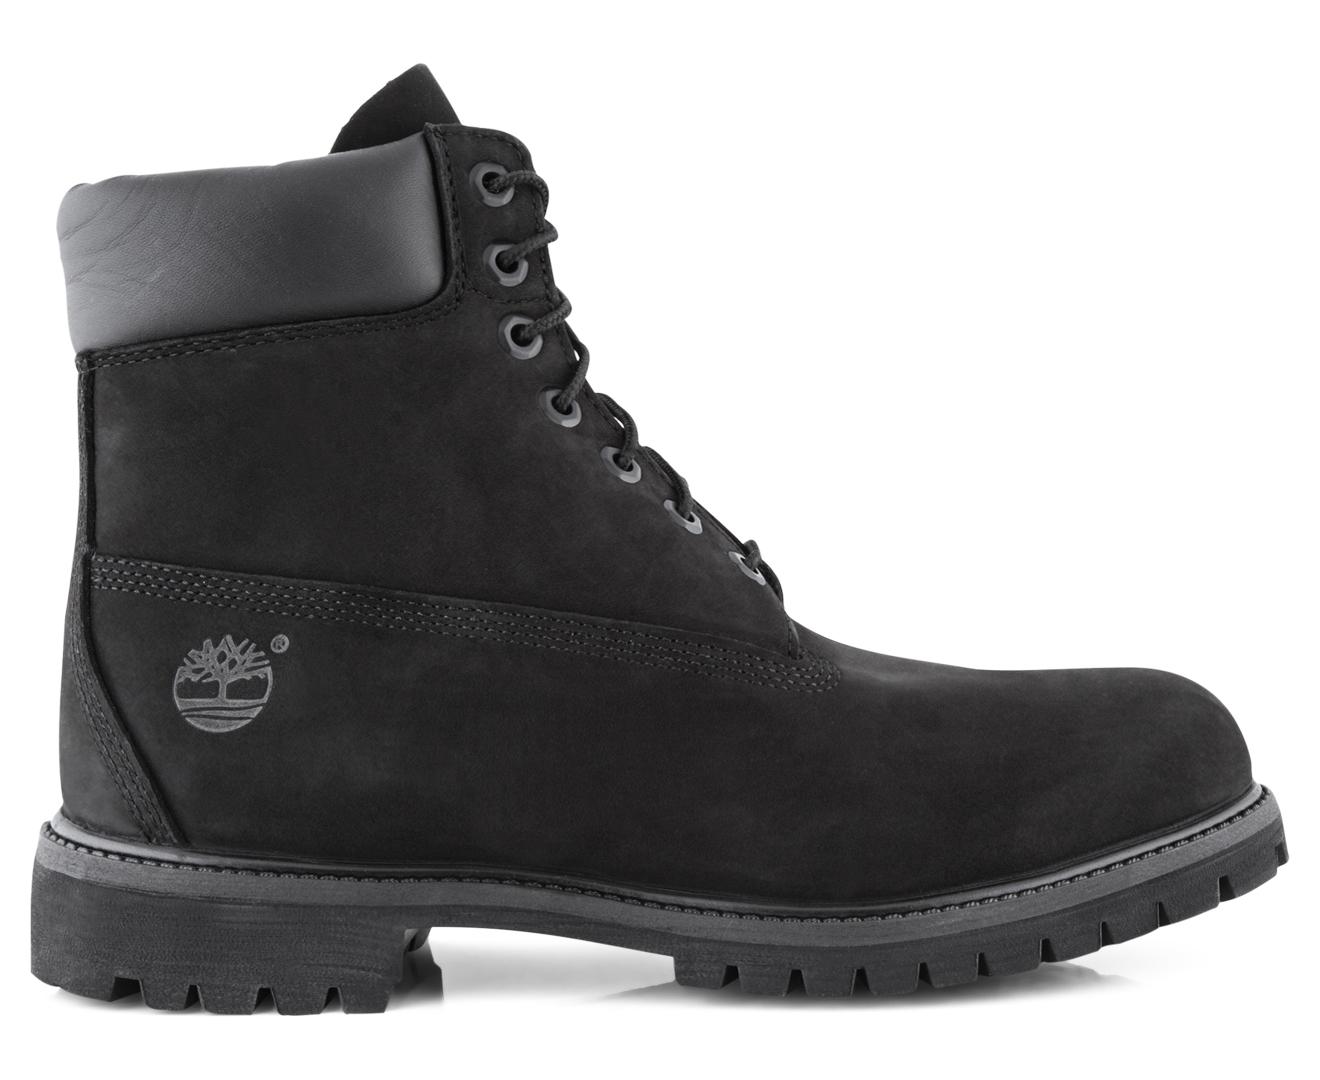 timberland men's 6 premium waterproof boot black nubuck